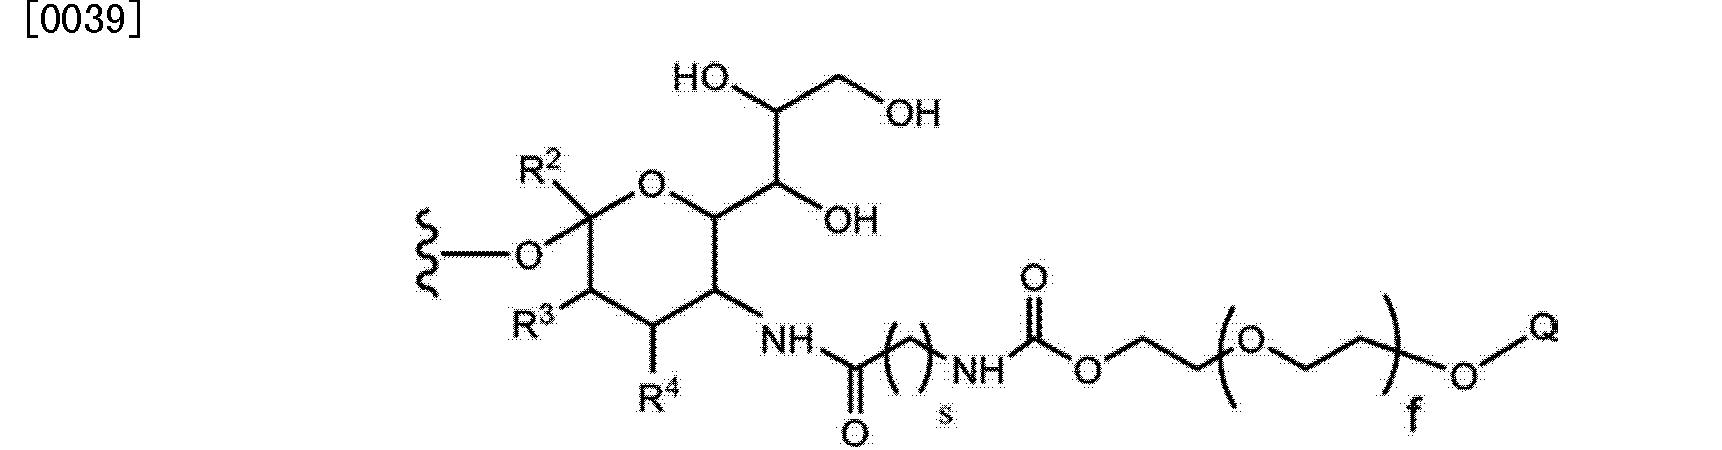 Figure CN102719508AD00153